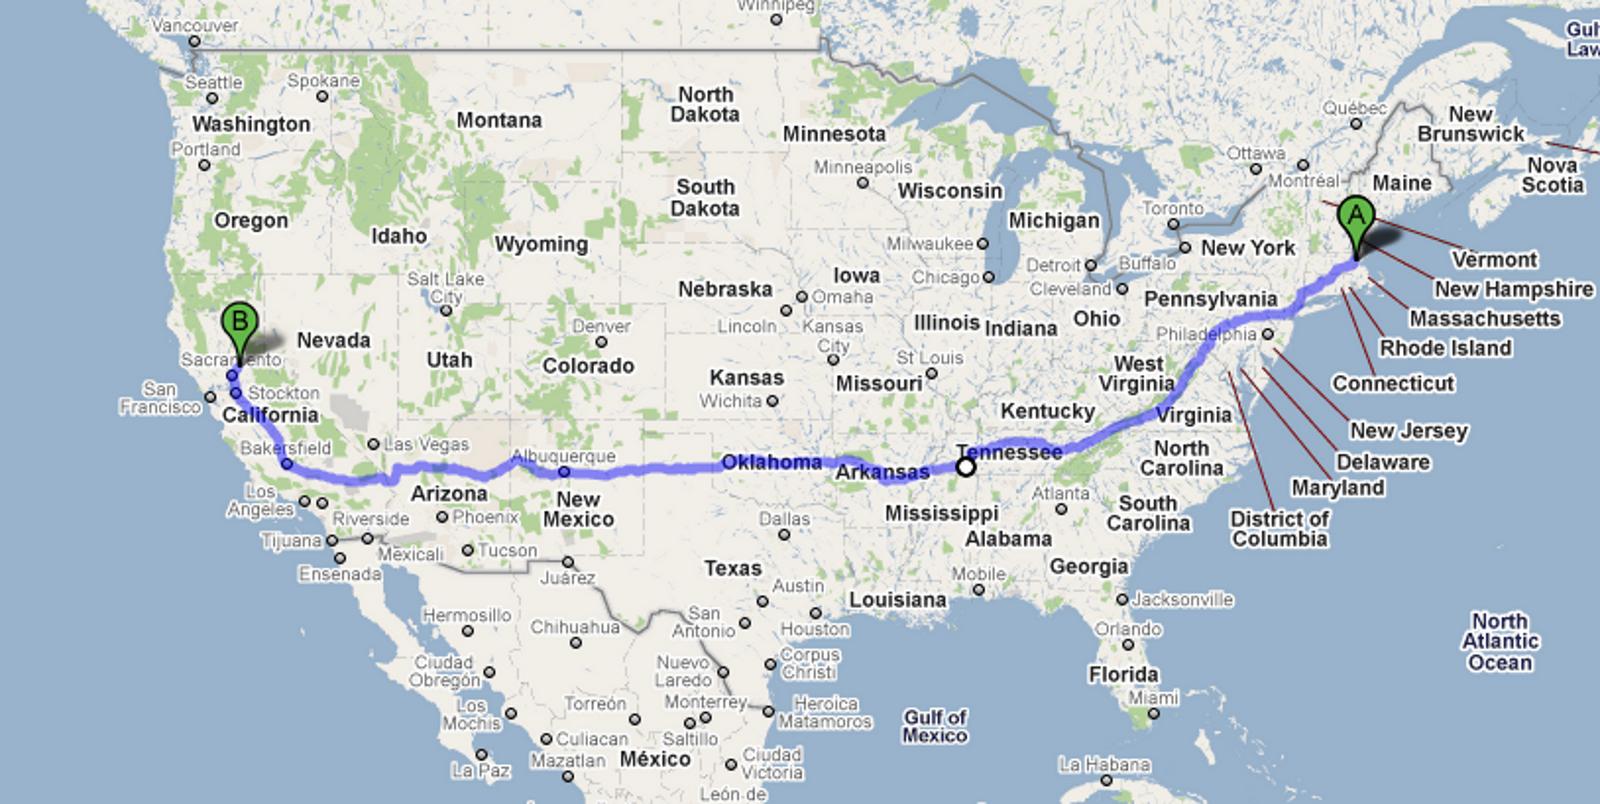 Rand Mcnally Us Wall Map M Series USA Wall Maps 50x32 Rand United